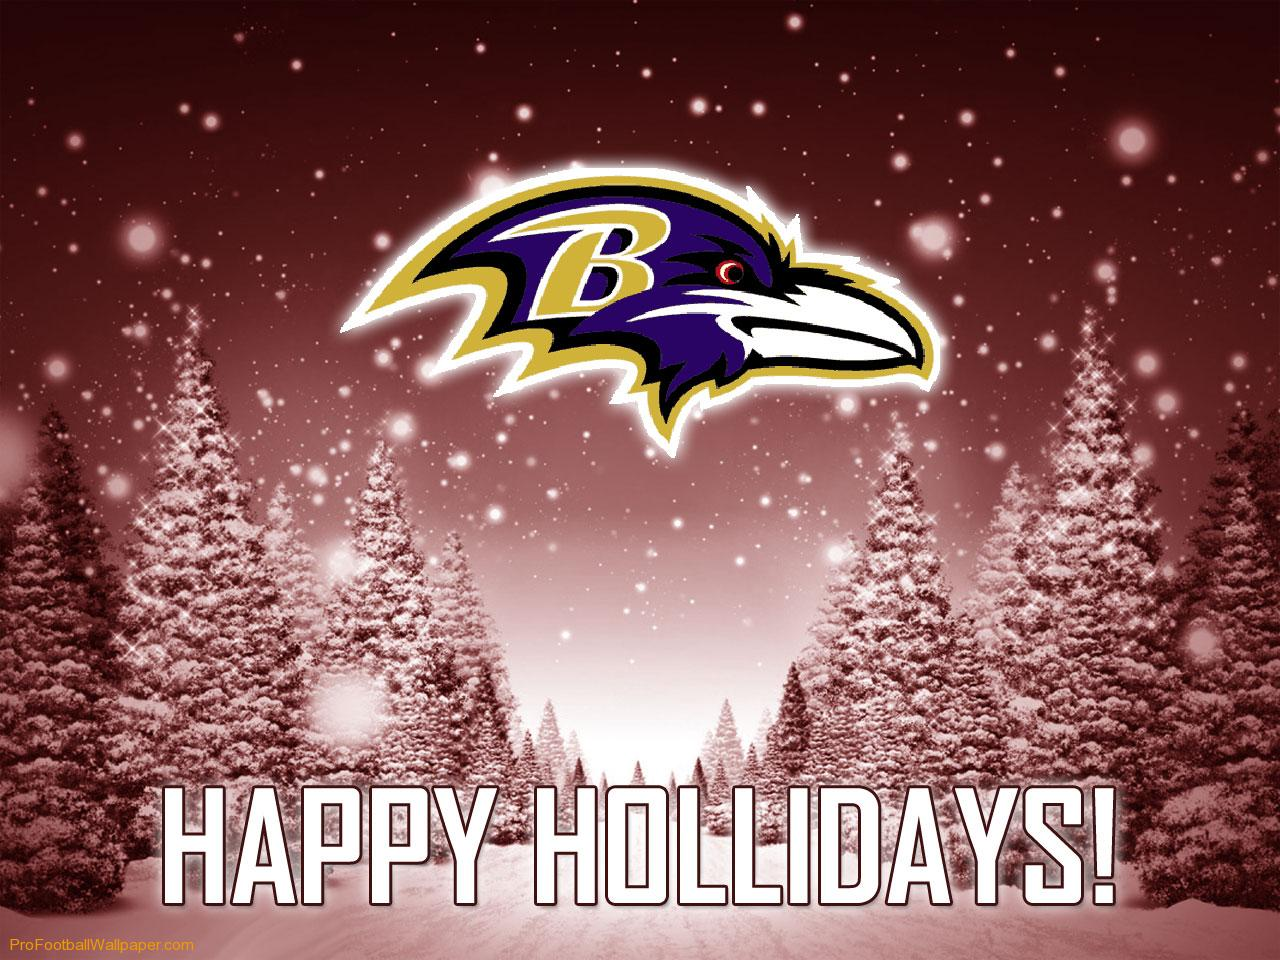 Baltimore Ravens Holidays Wallpaper 177612 HD Wallpaper Res 1280x960 1280x960